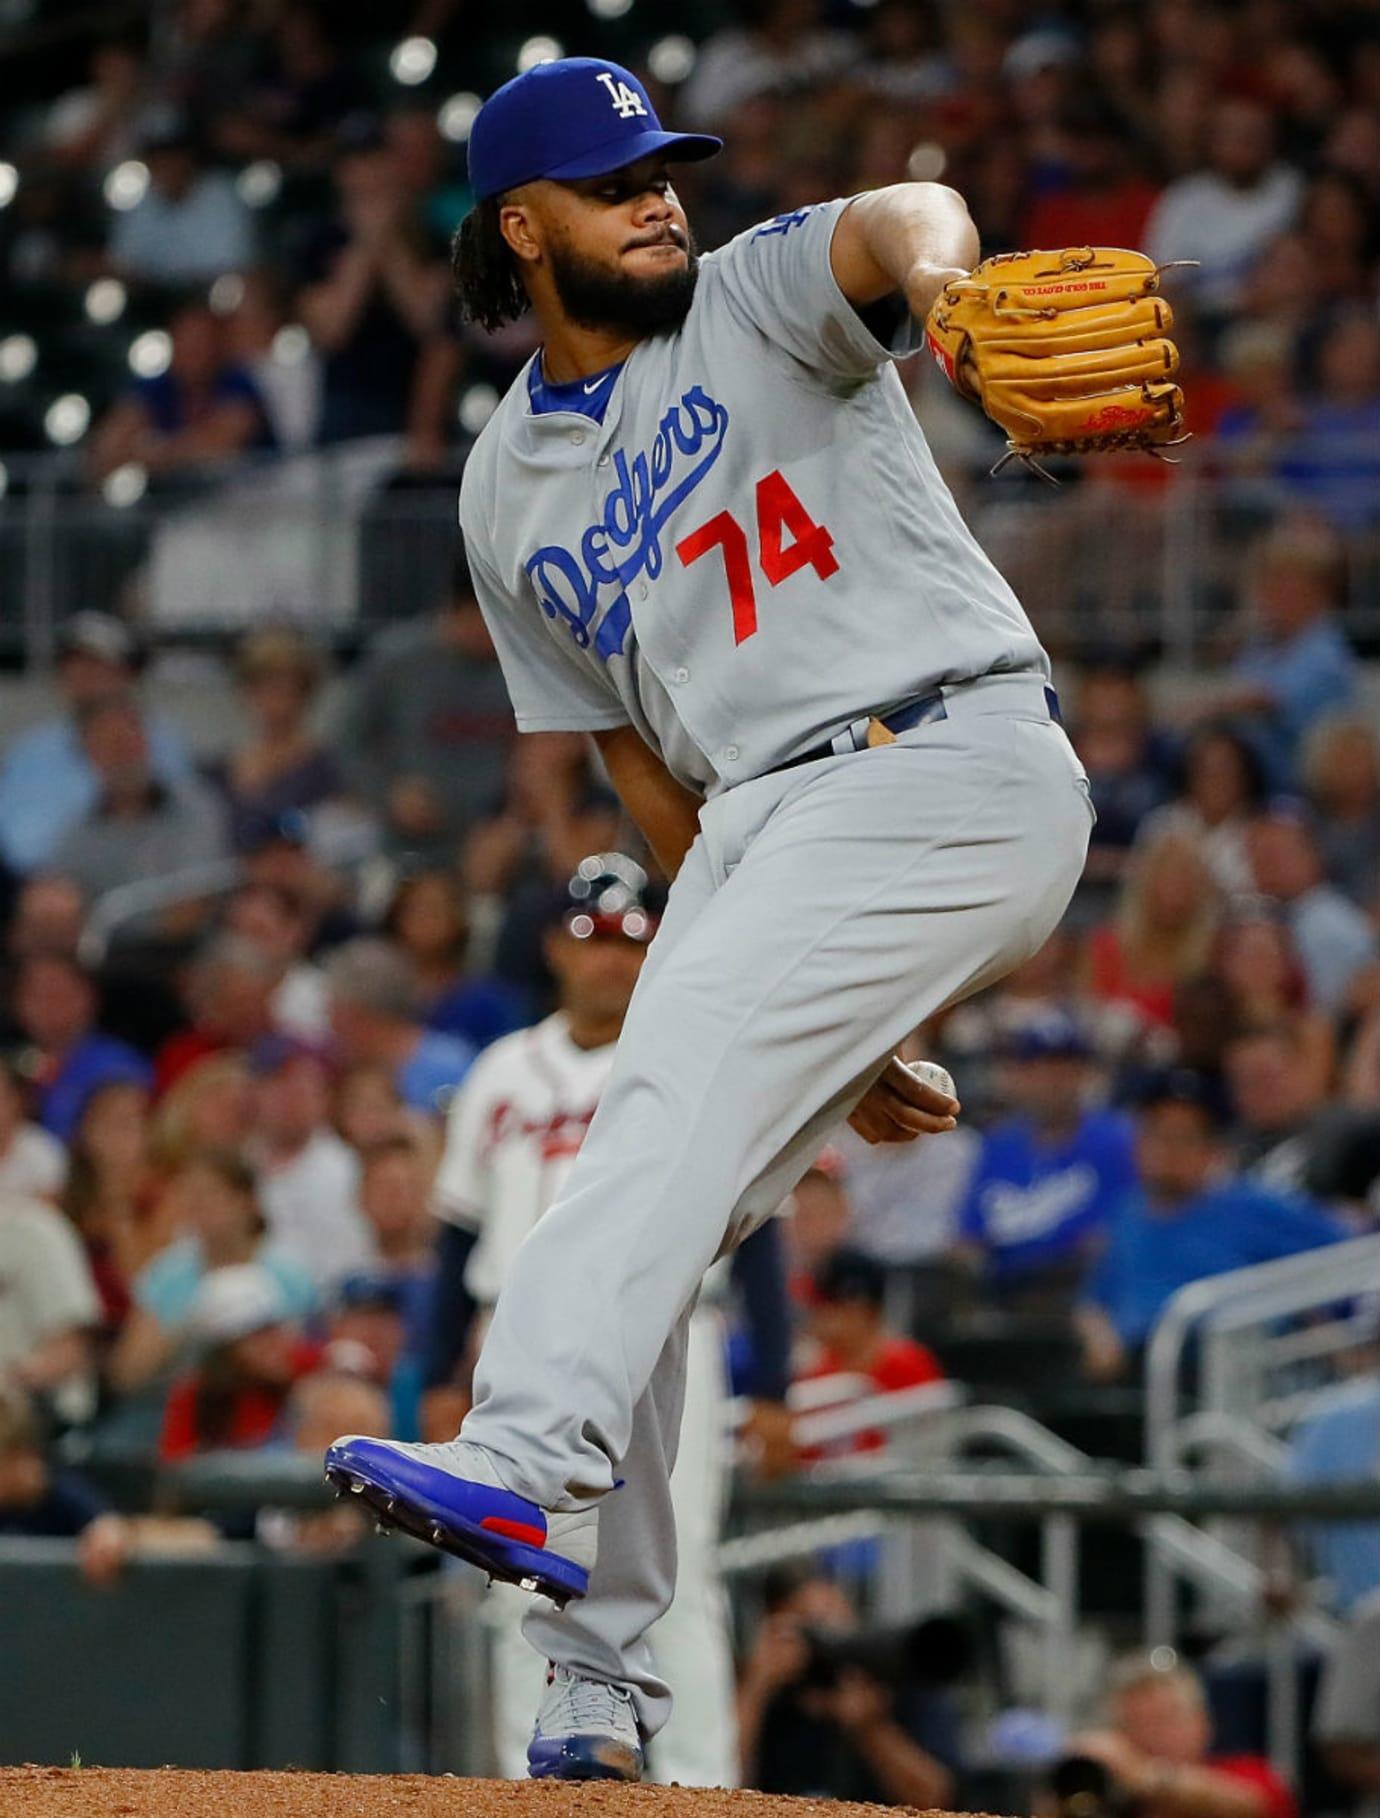 Kenley Jansen Air Jordan 12 Grey/Blue Dodgers PE Cleats